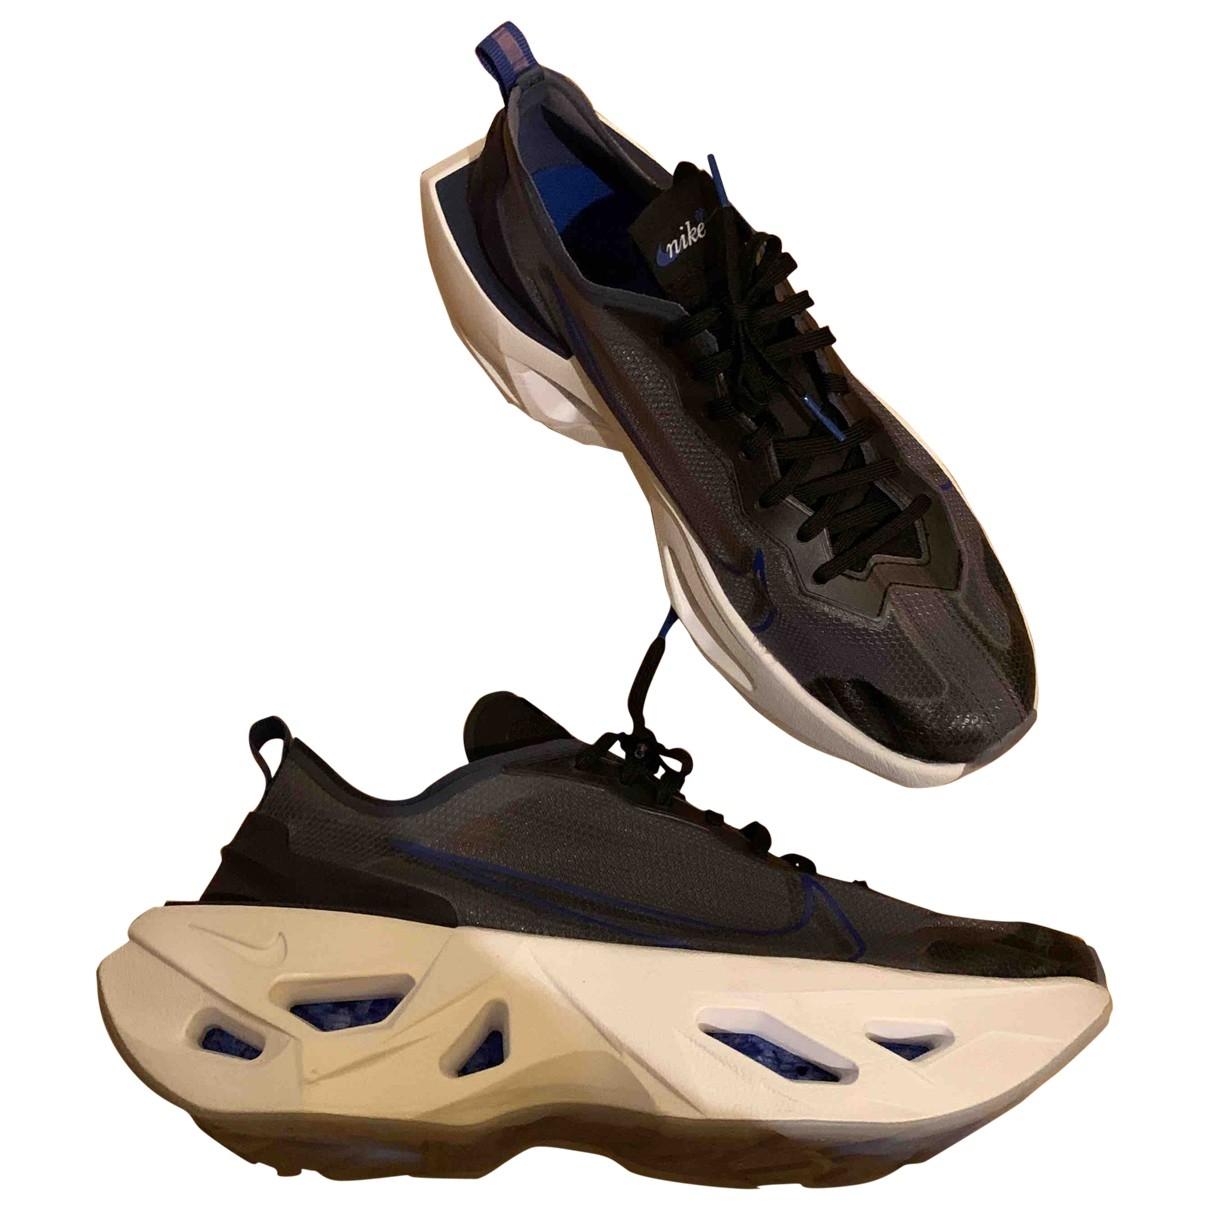 Nike - Baskets Zoom X Vista Grind pour homme en toile - anthracite